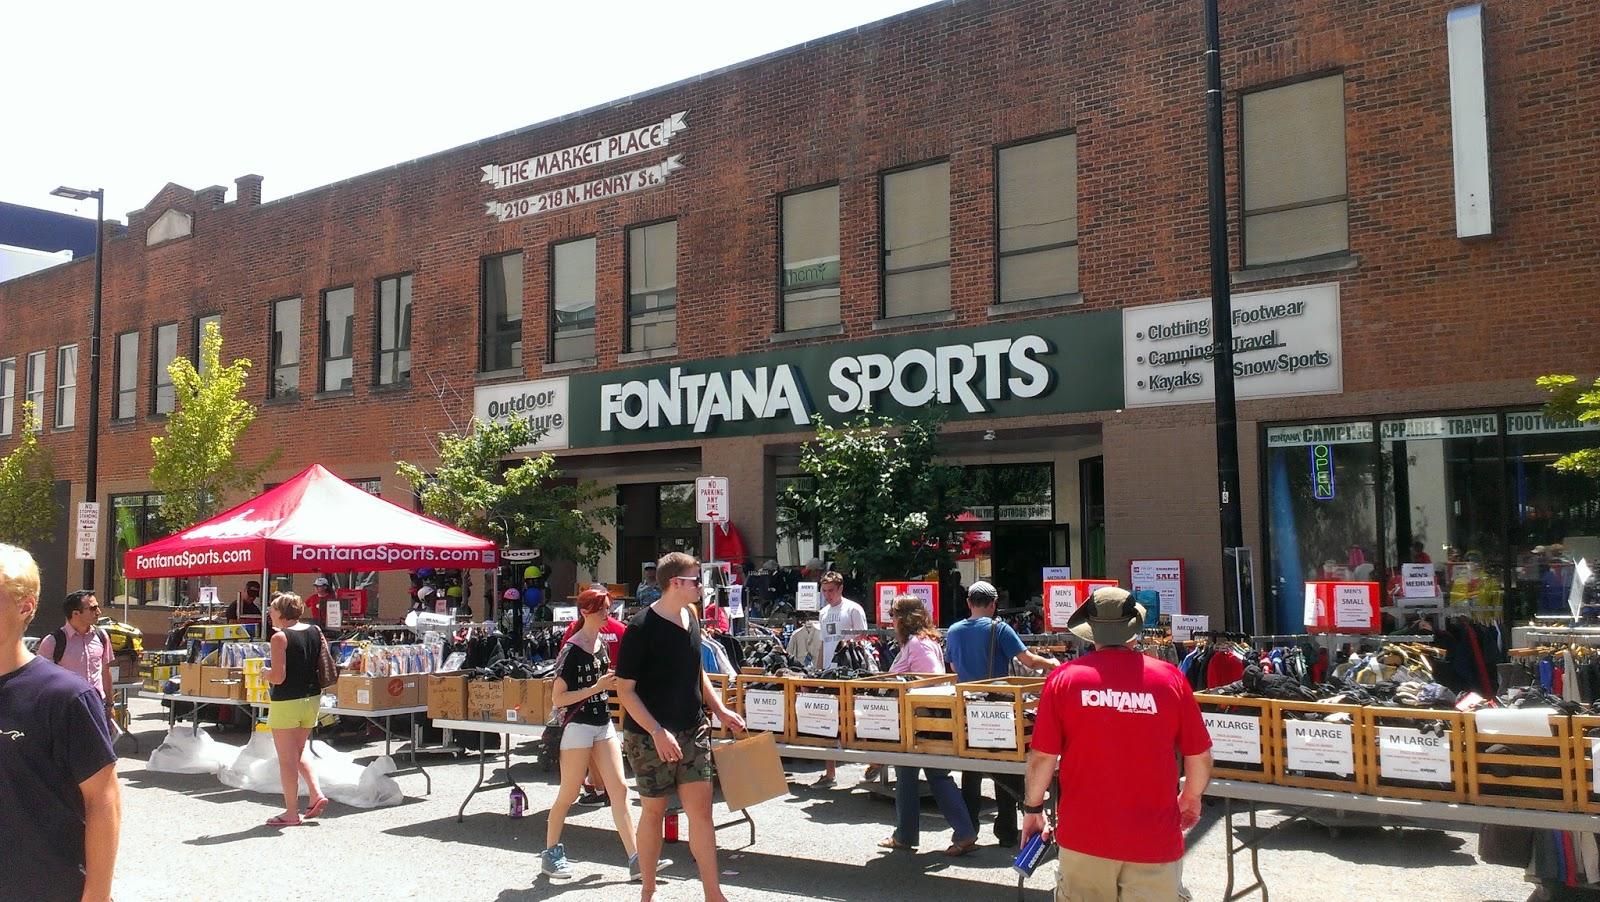 7fbc2503633 Fontana Sports - The Outdoor Sports Experts: Fontana Sports' MSD ...